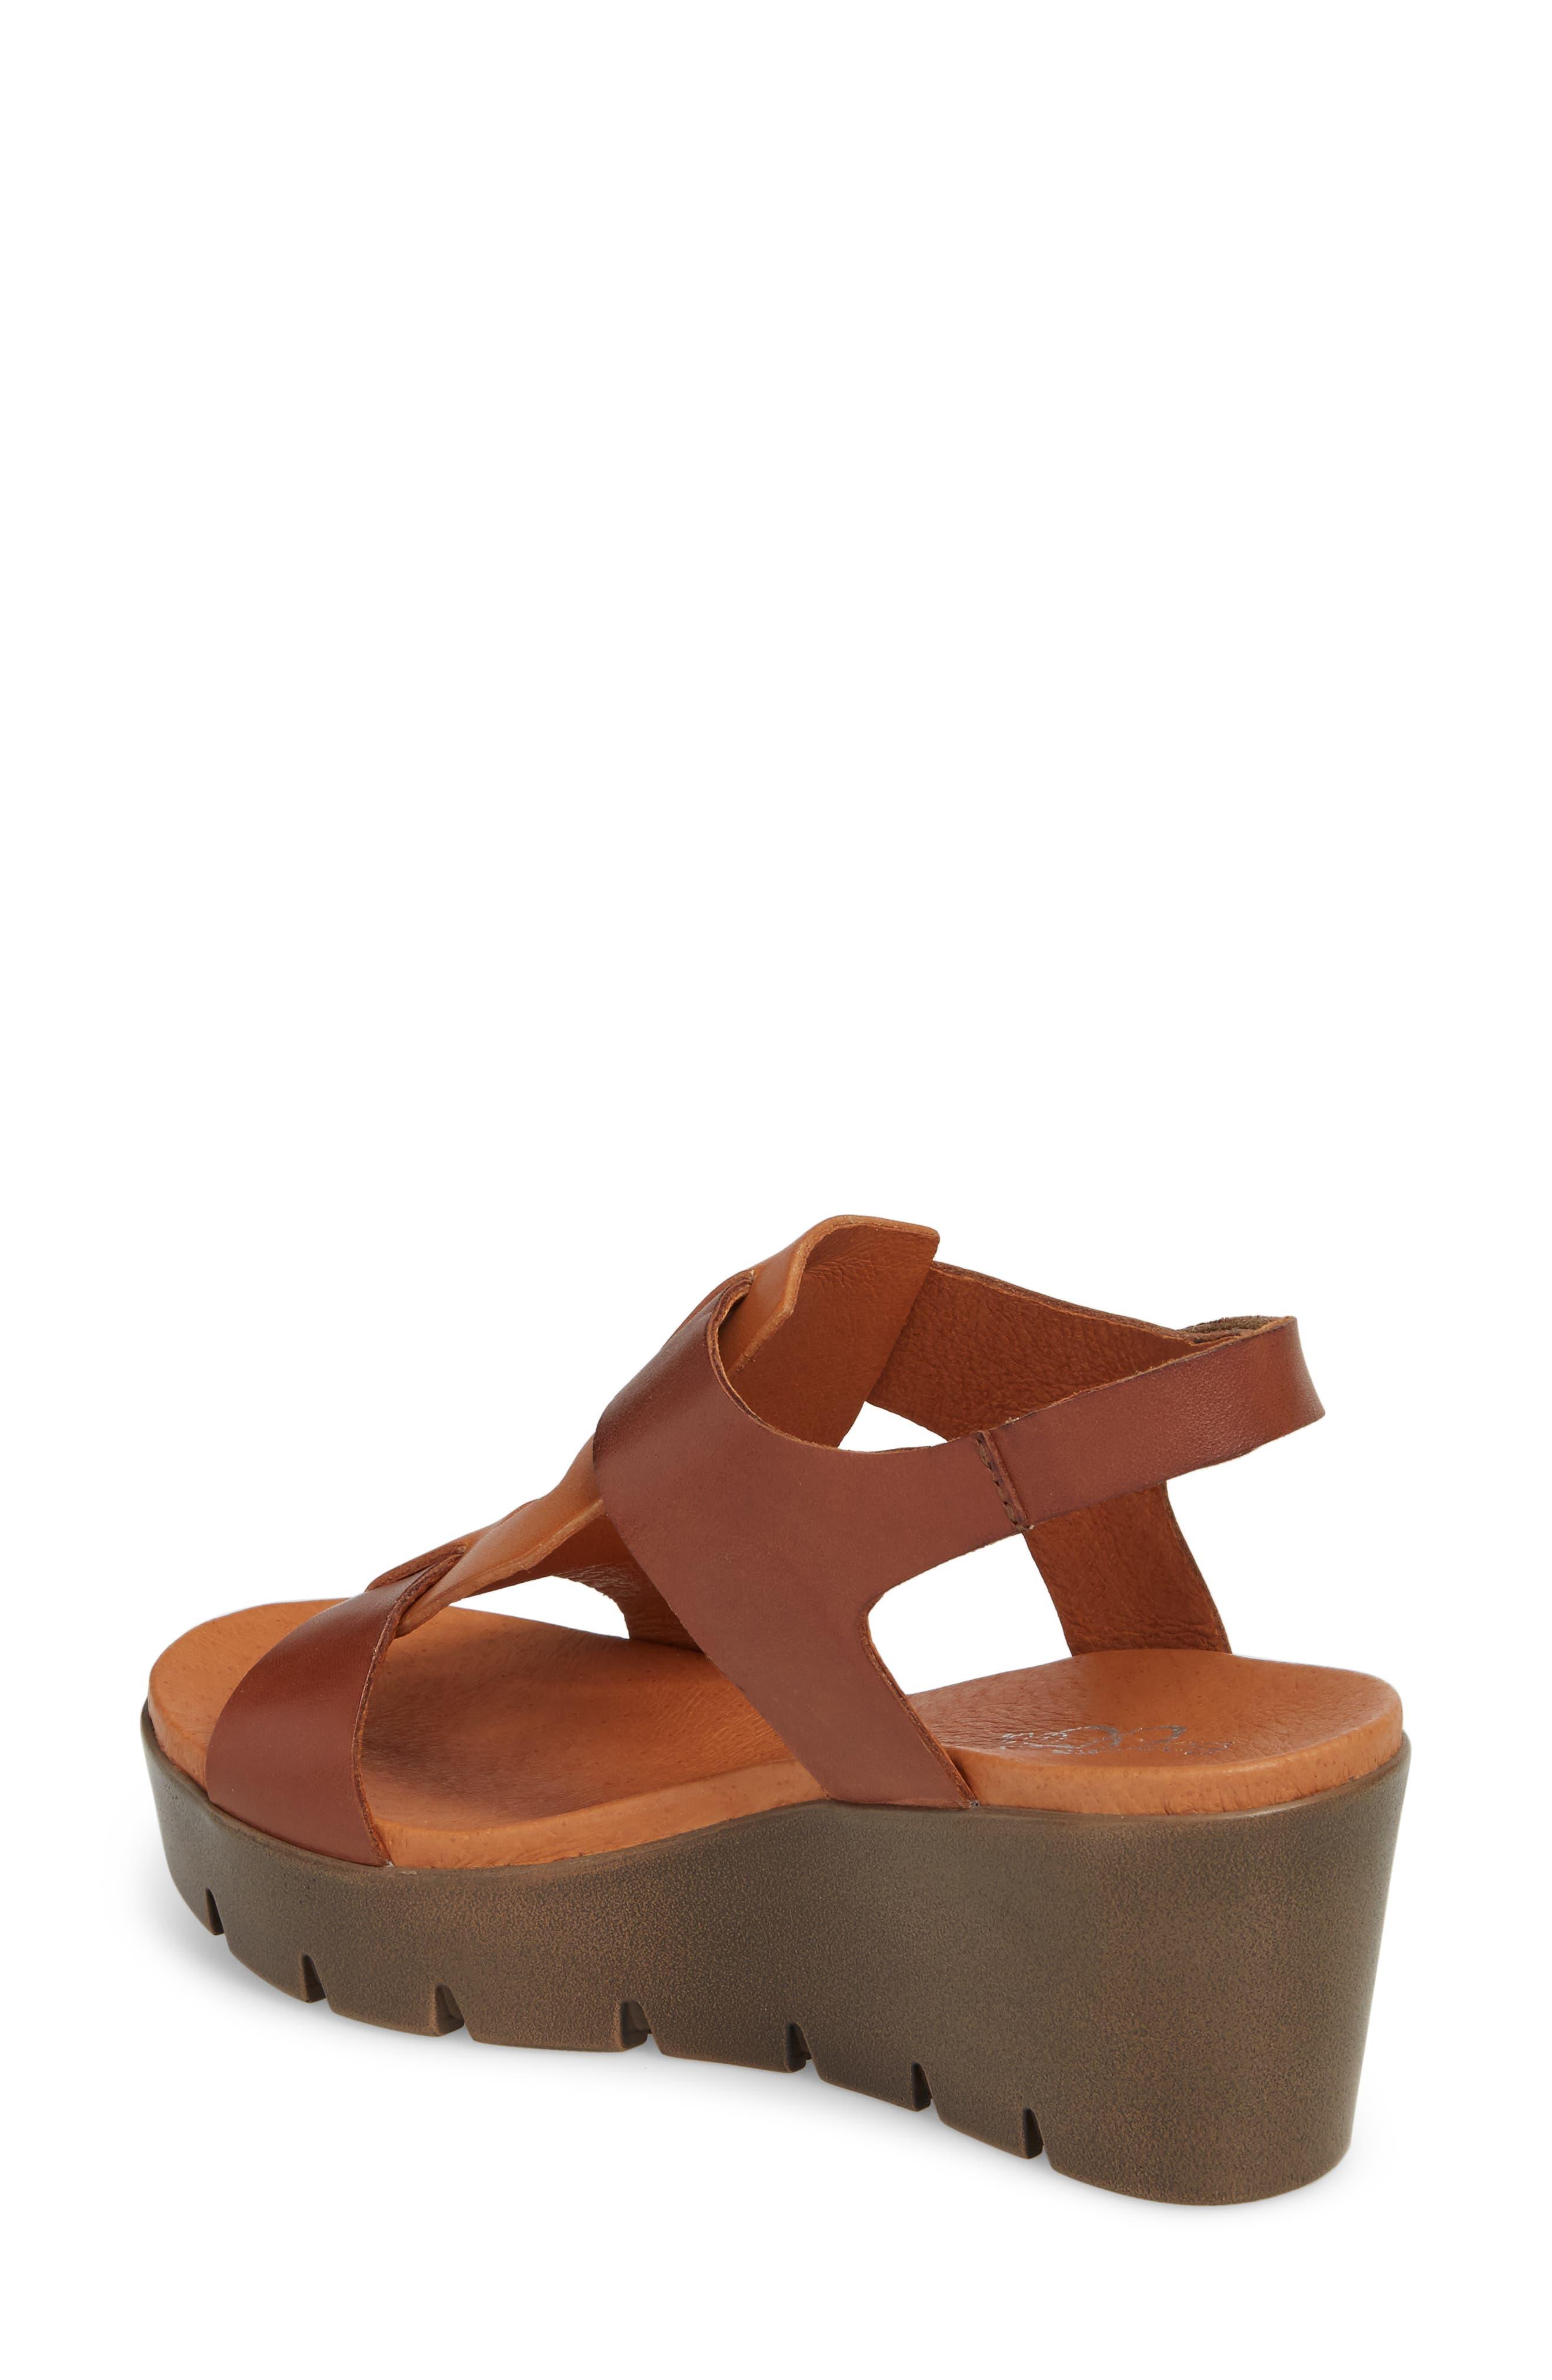 Somo Platform Wedge Sandal,                             Alternate thumbnail 2, color,                             Cognac/ Camel Leather